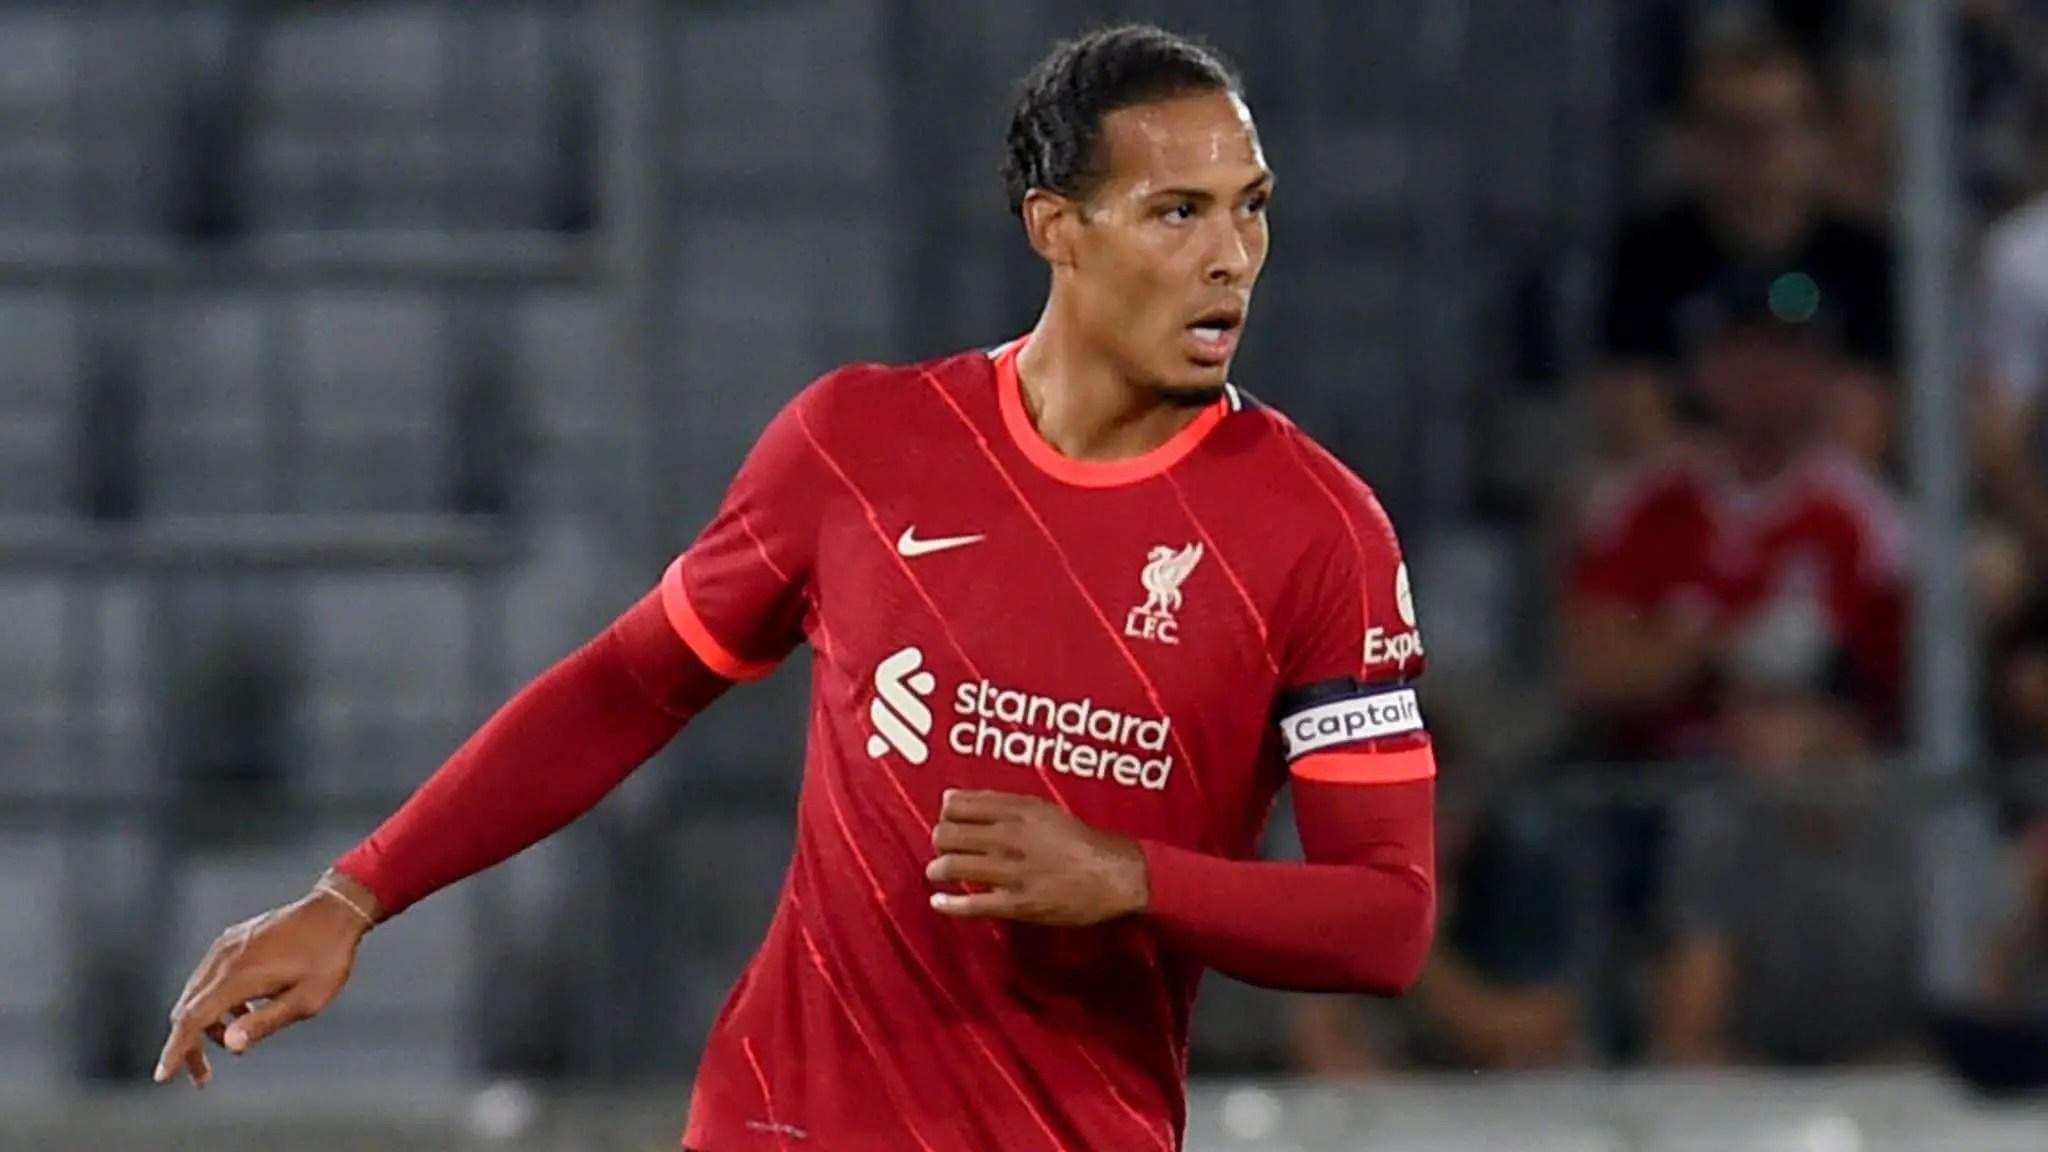 Don't Rush Van Dijk From Injury -Carragher Warns Liverpool